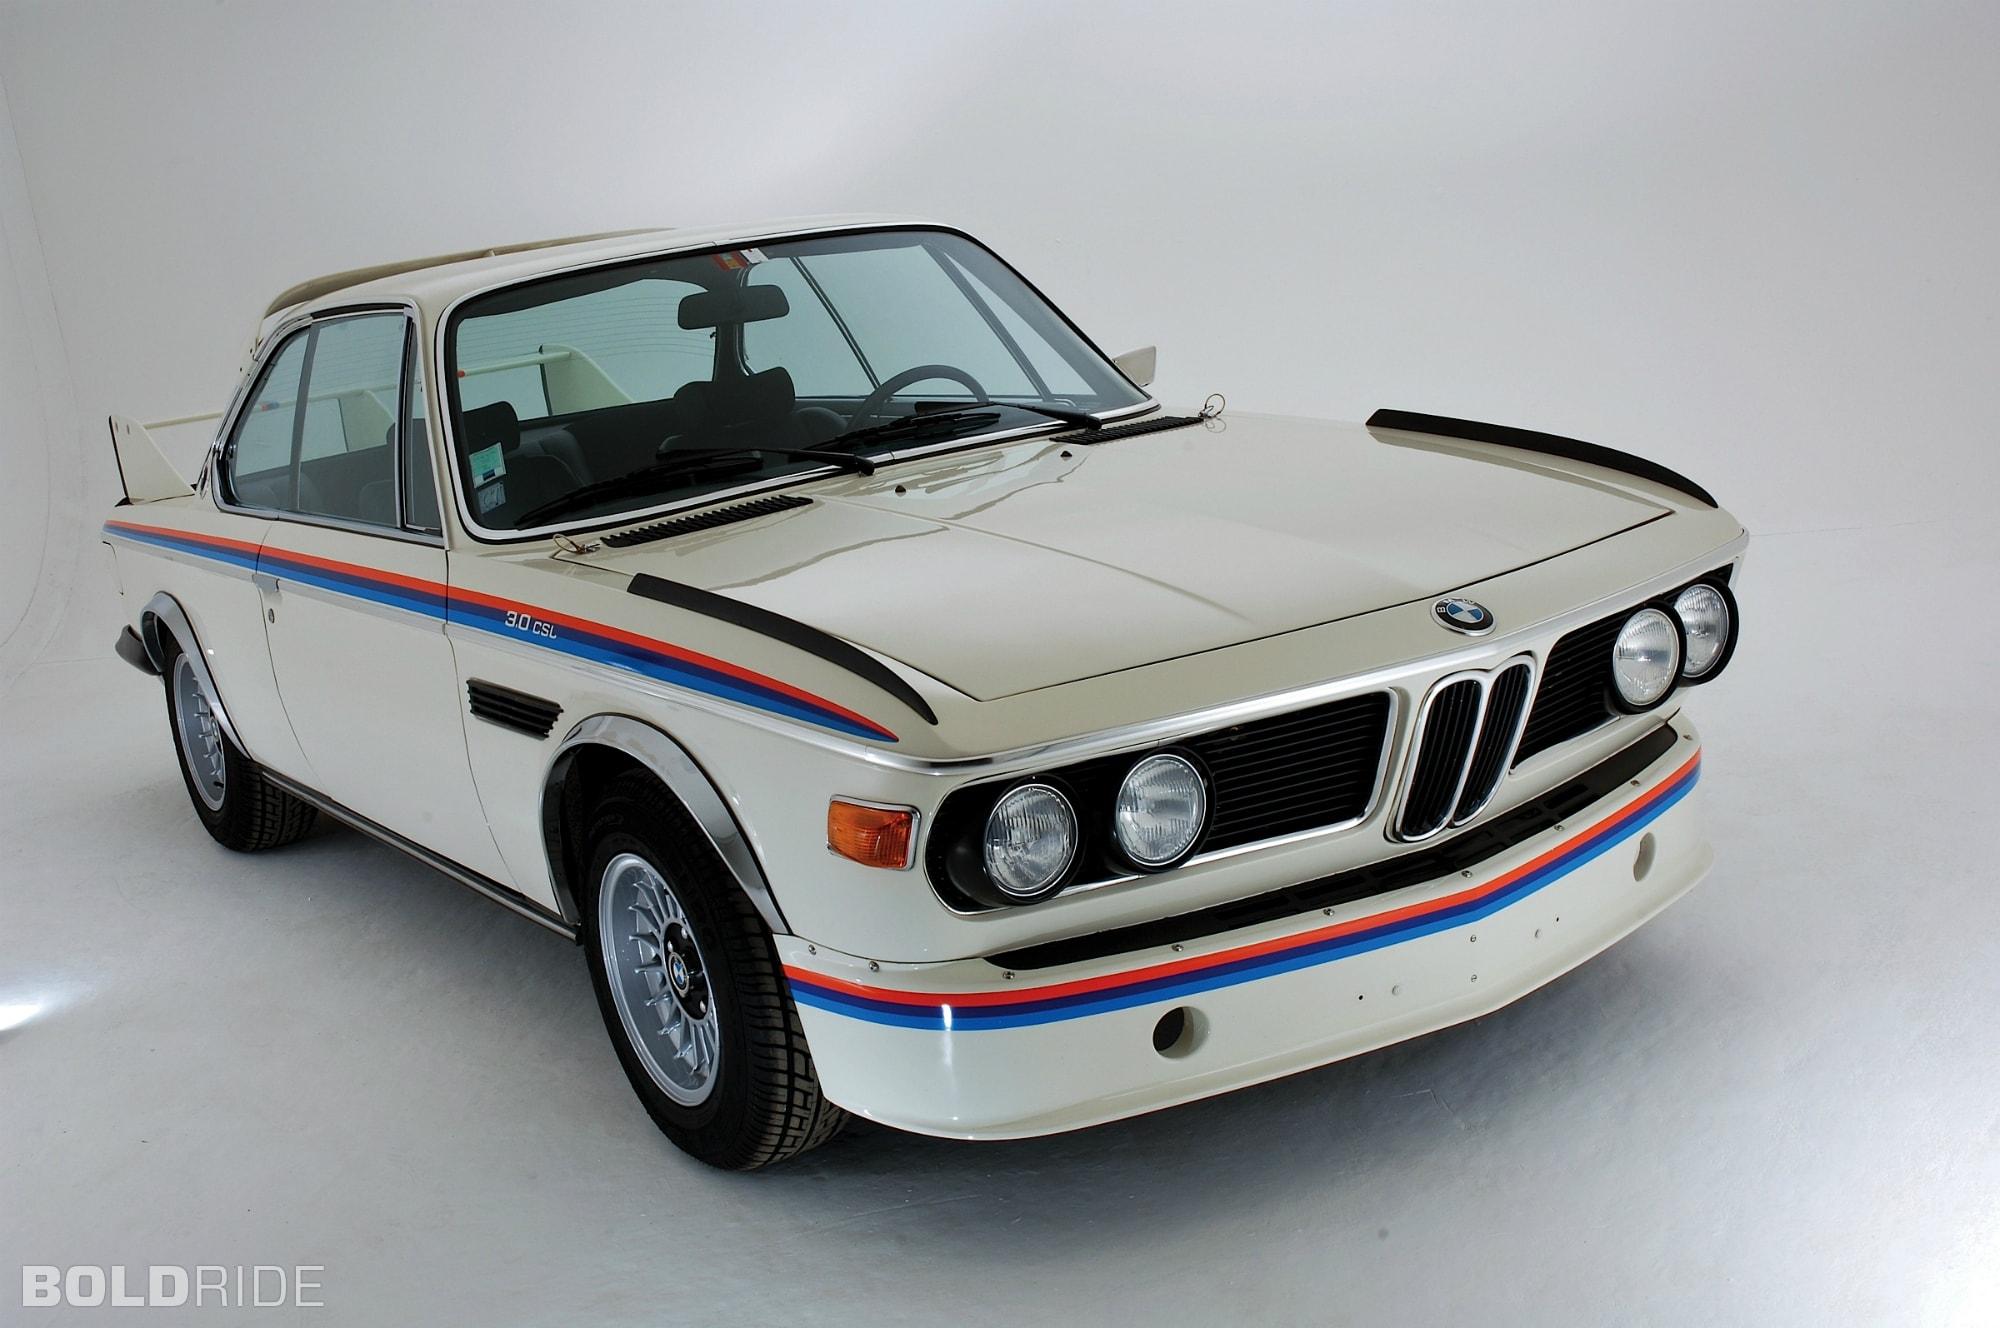 1973 BMW 3.0 CSi Full hd wallpapers